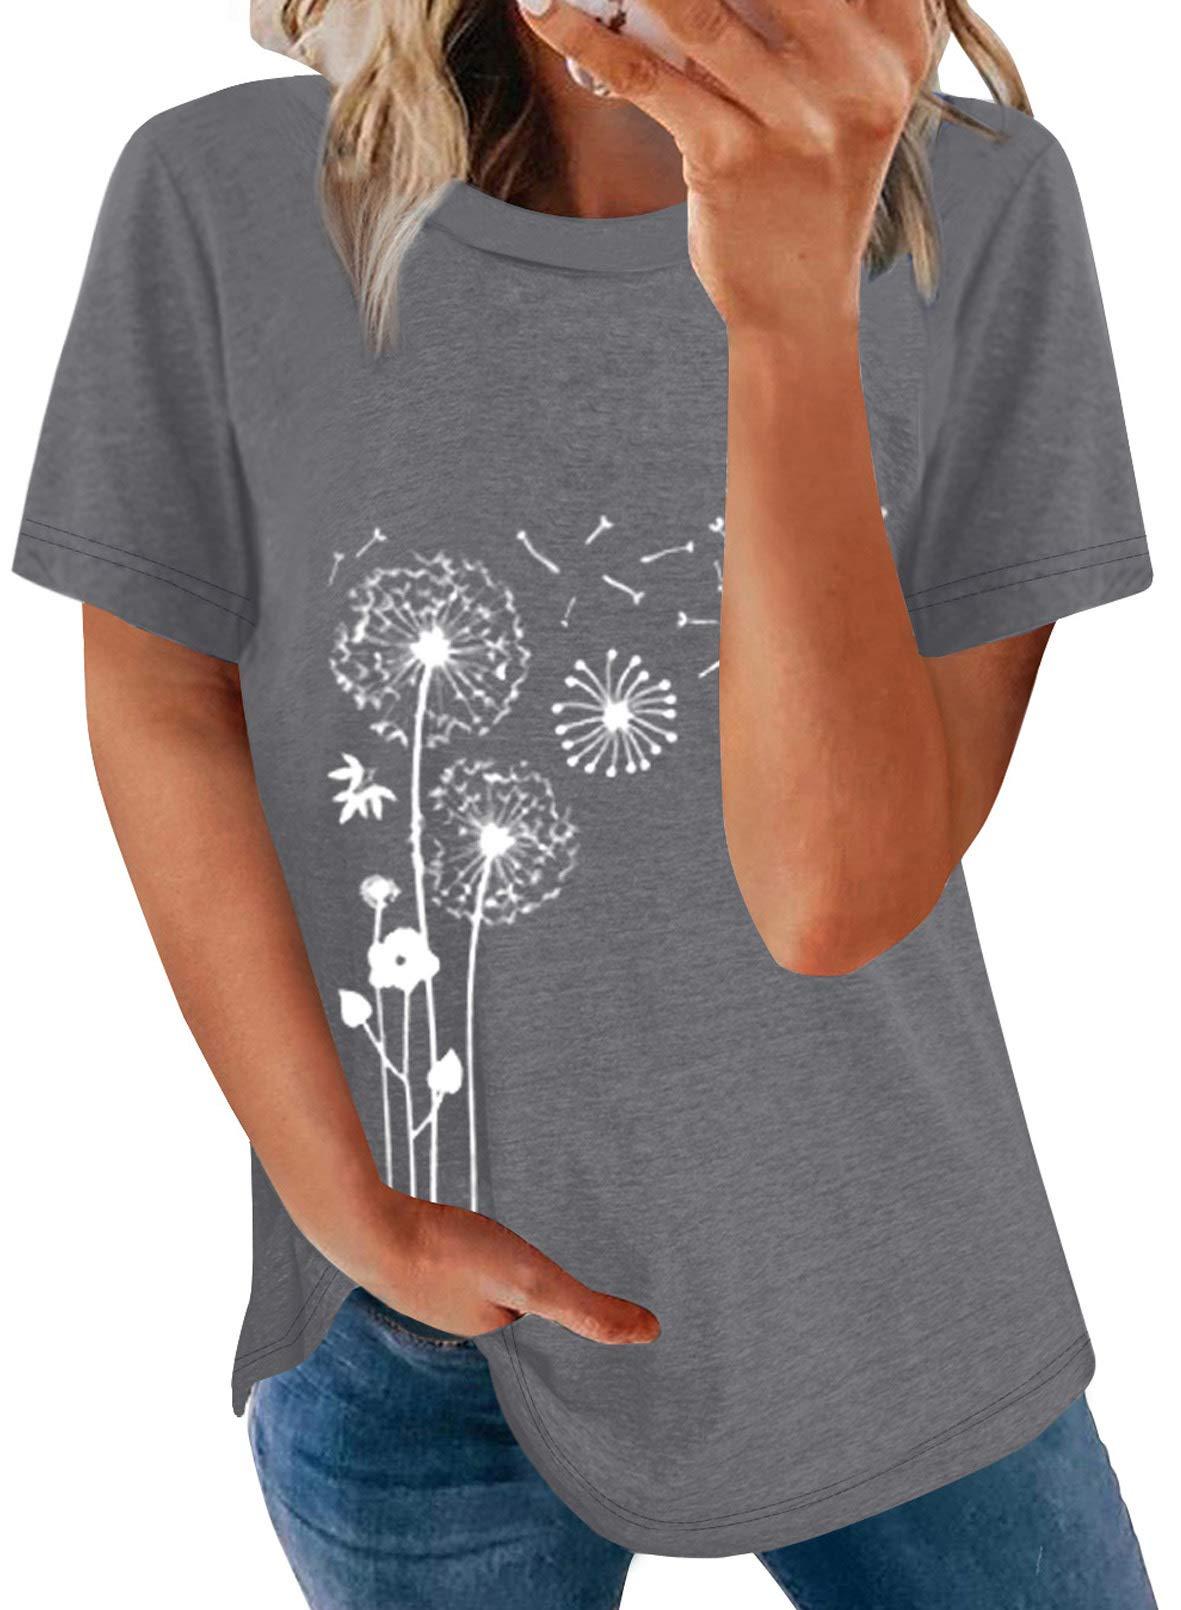 FARYSAYS Womens Summer Graphic T Shirt Tops Crewneck Short Sleeve Tee Tunic Blouse